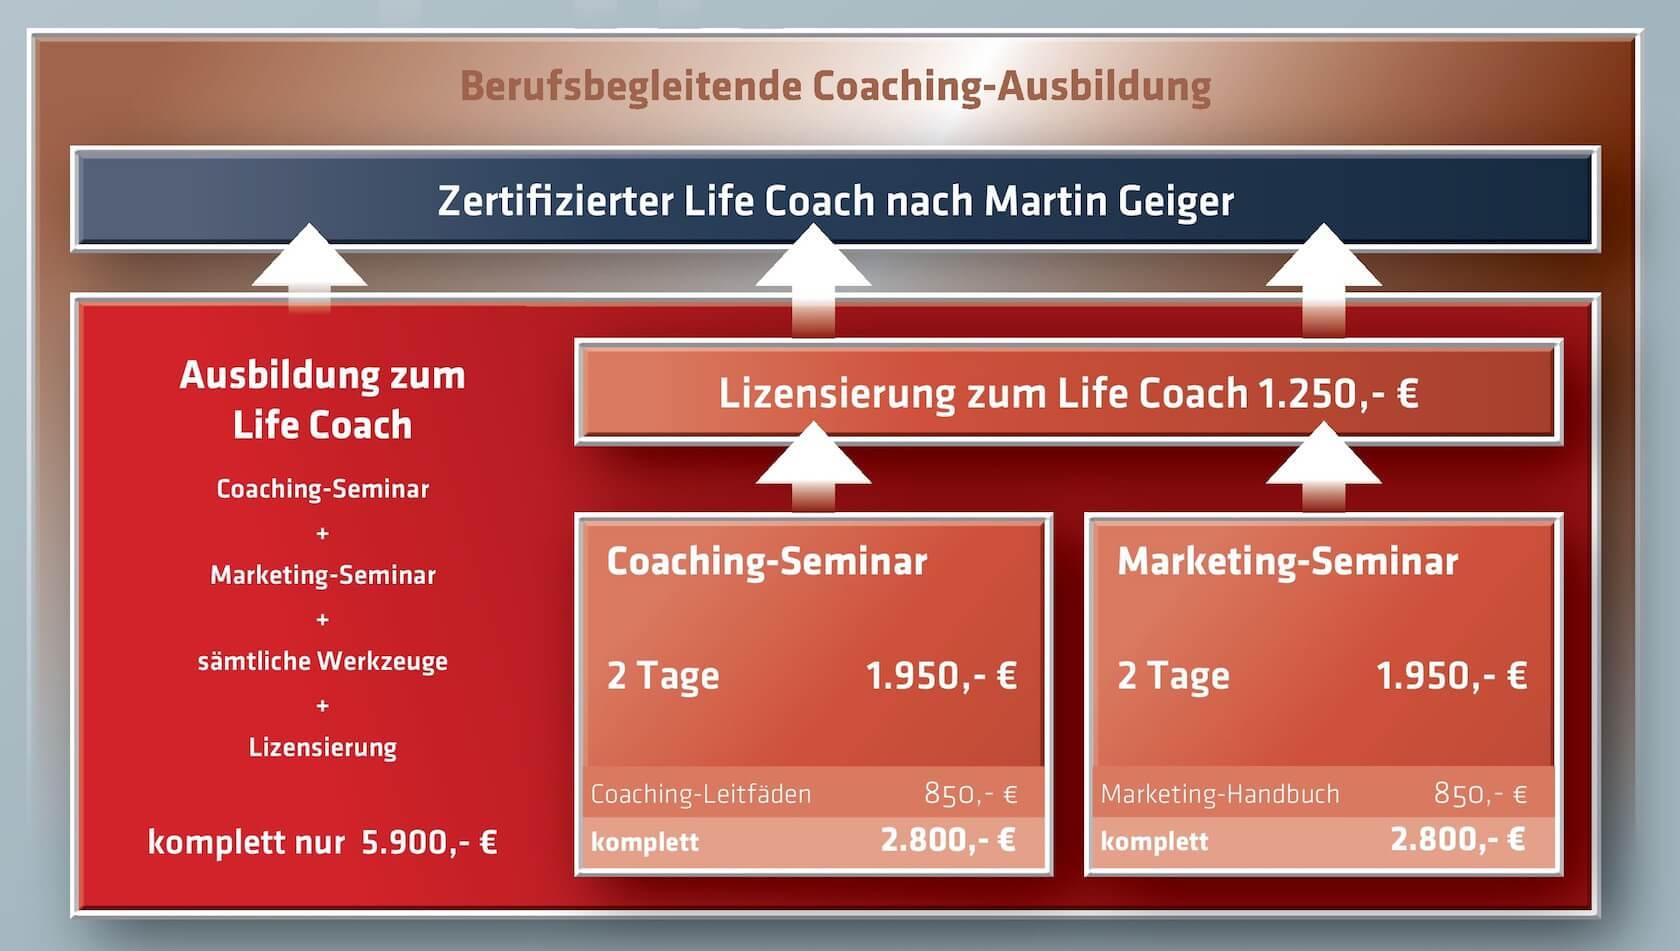 Martin Geiger - Berufsbegleitende Coaching-Ausbildung